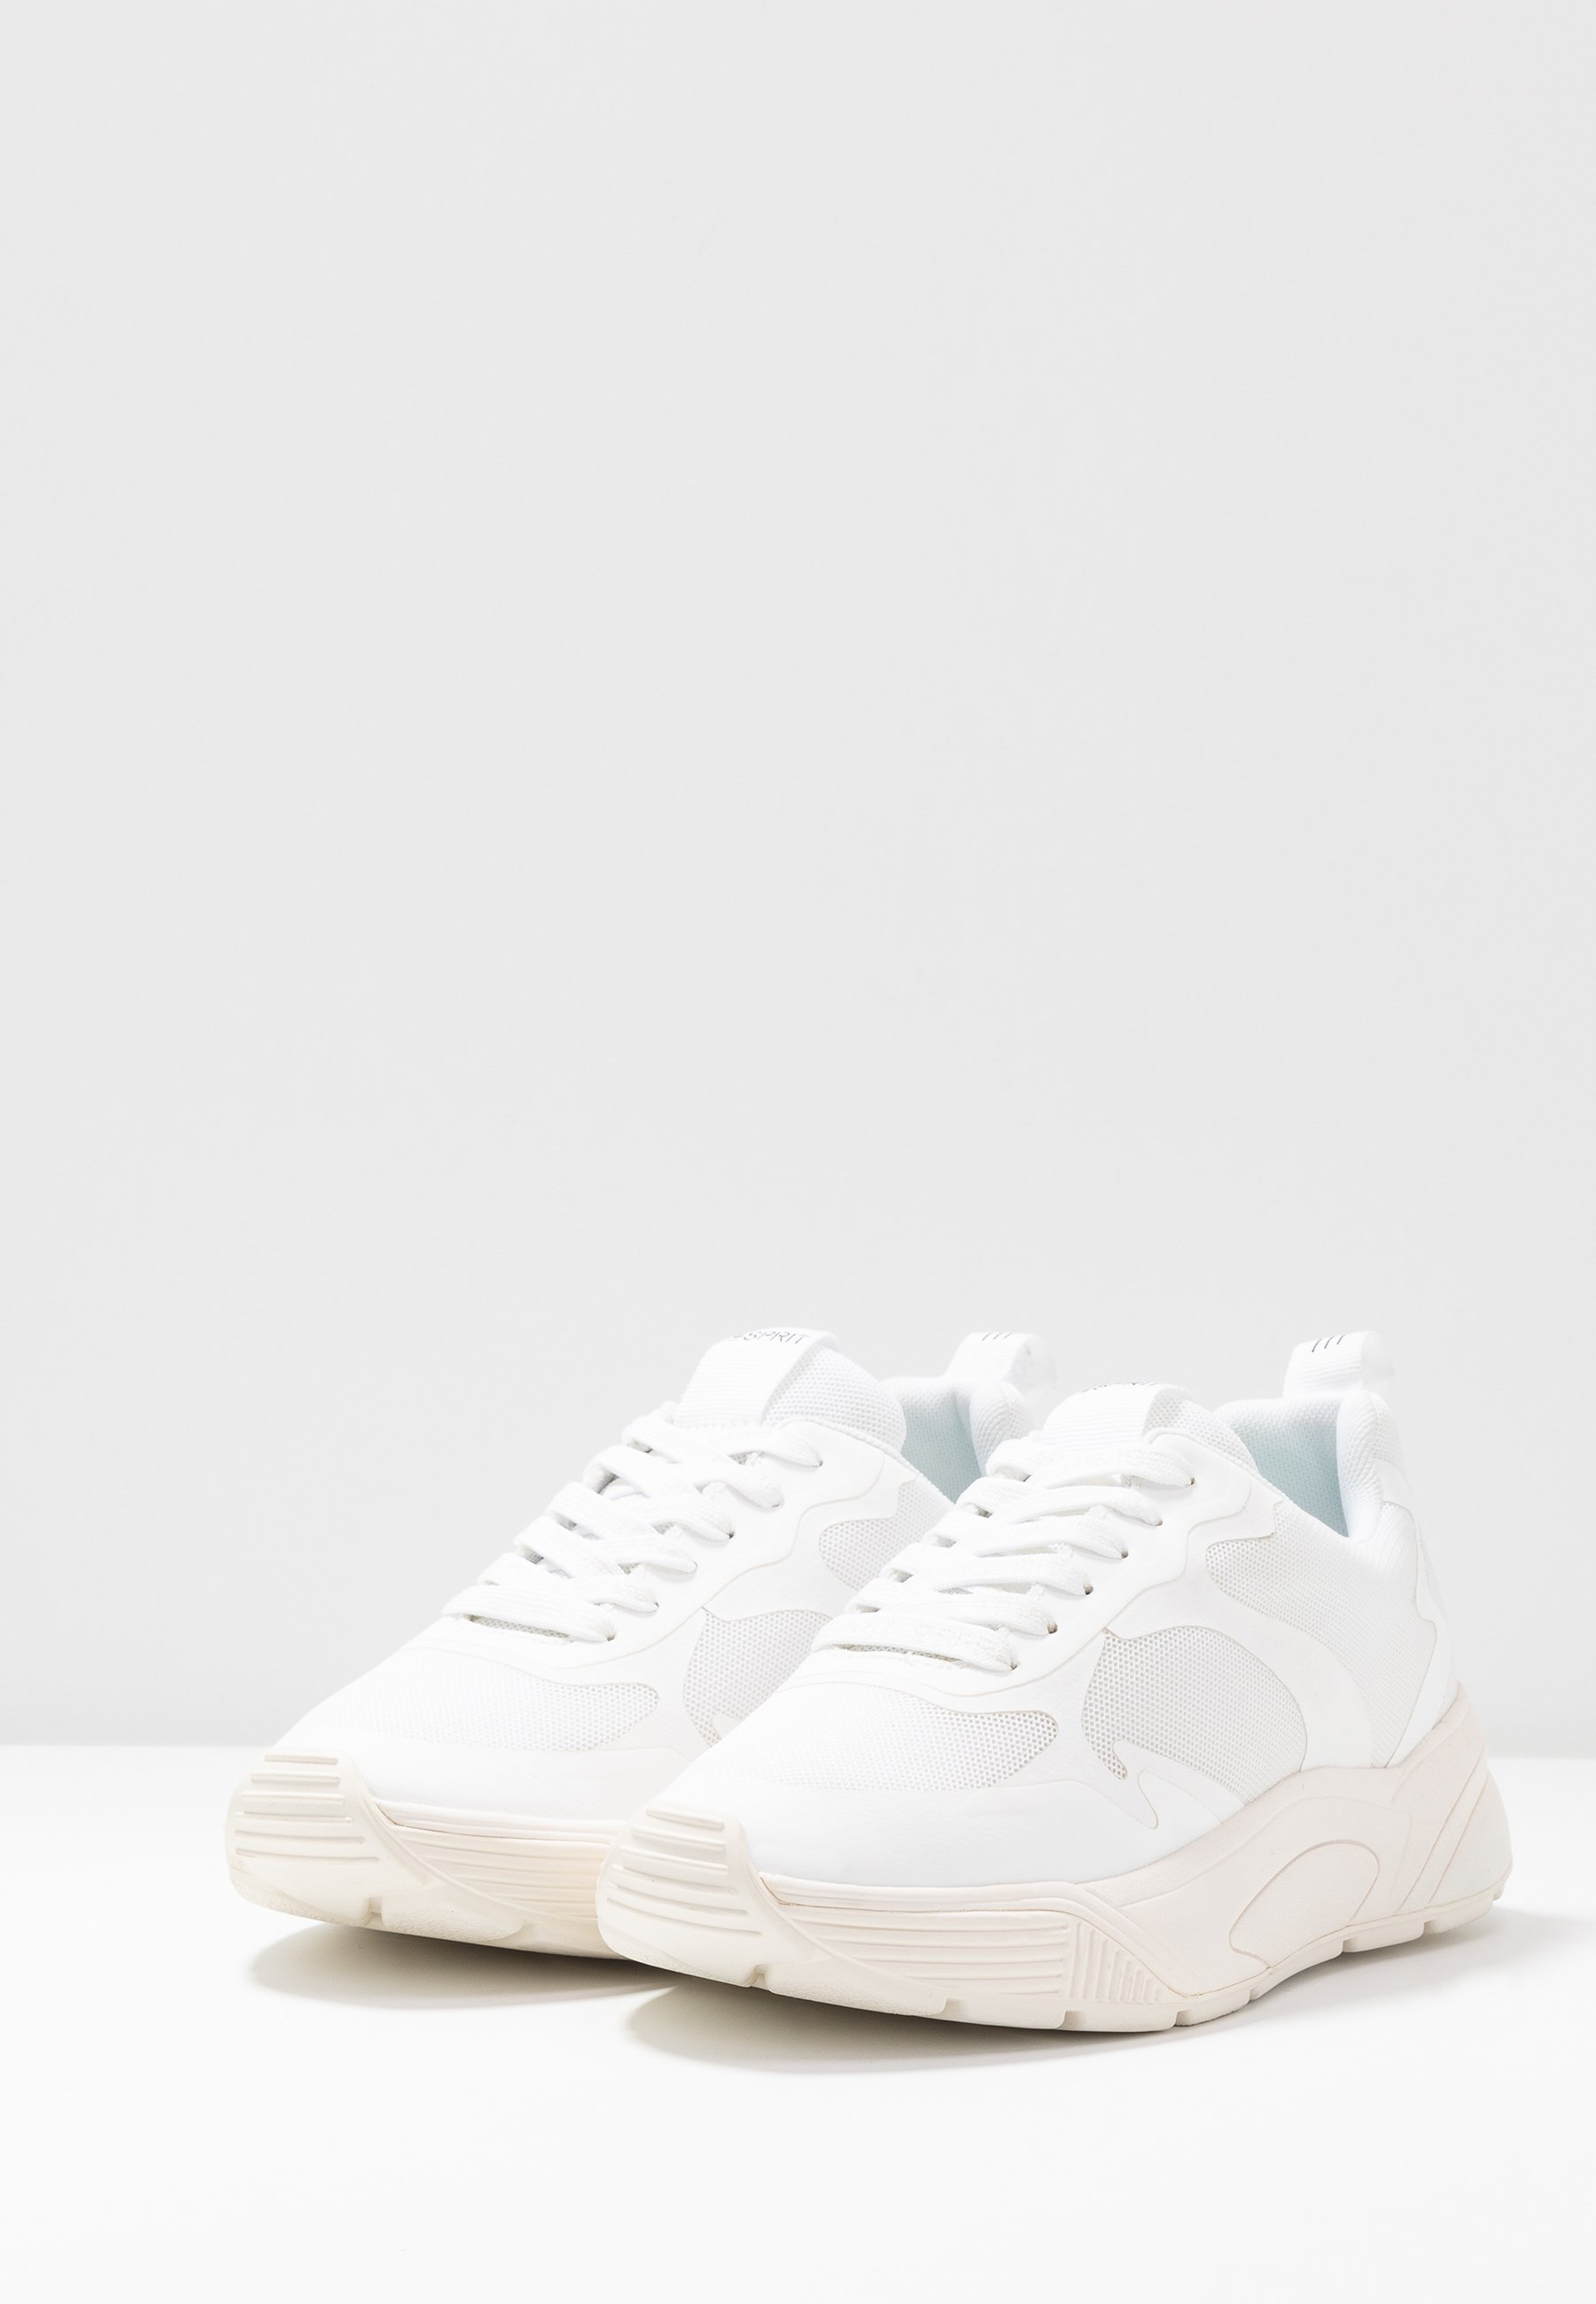 Esprit Misha - Sneakers White